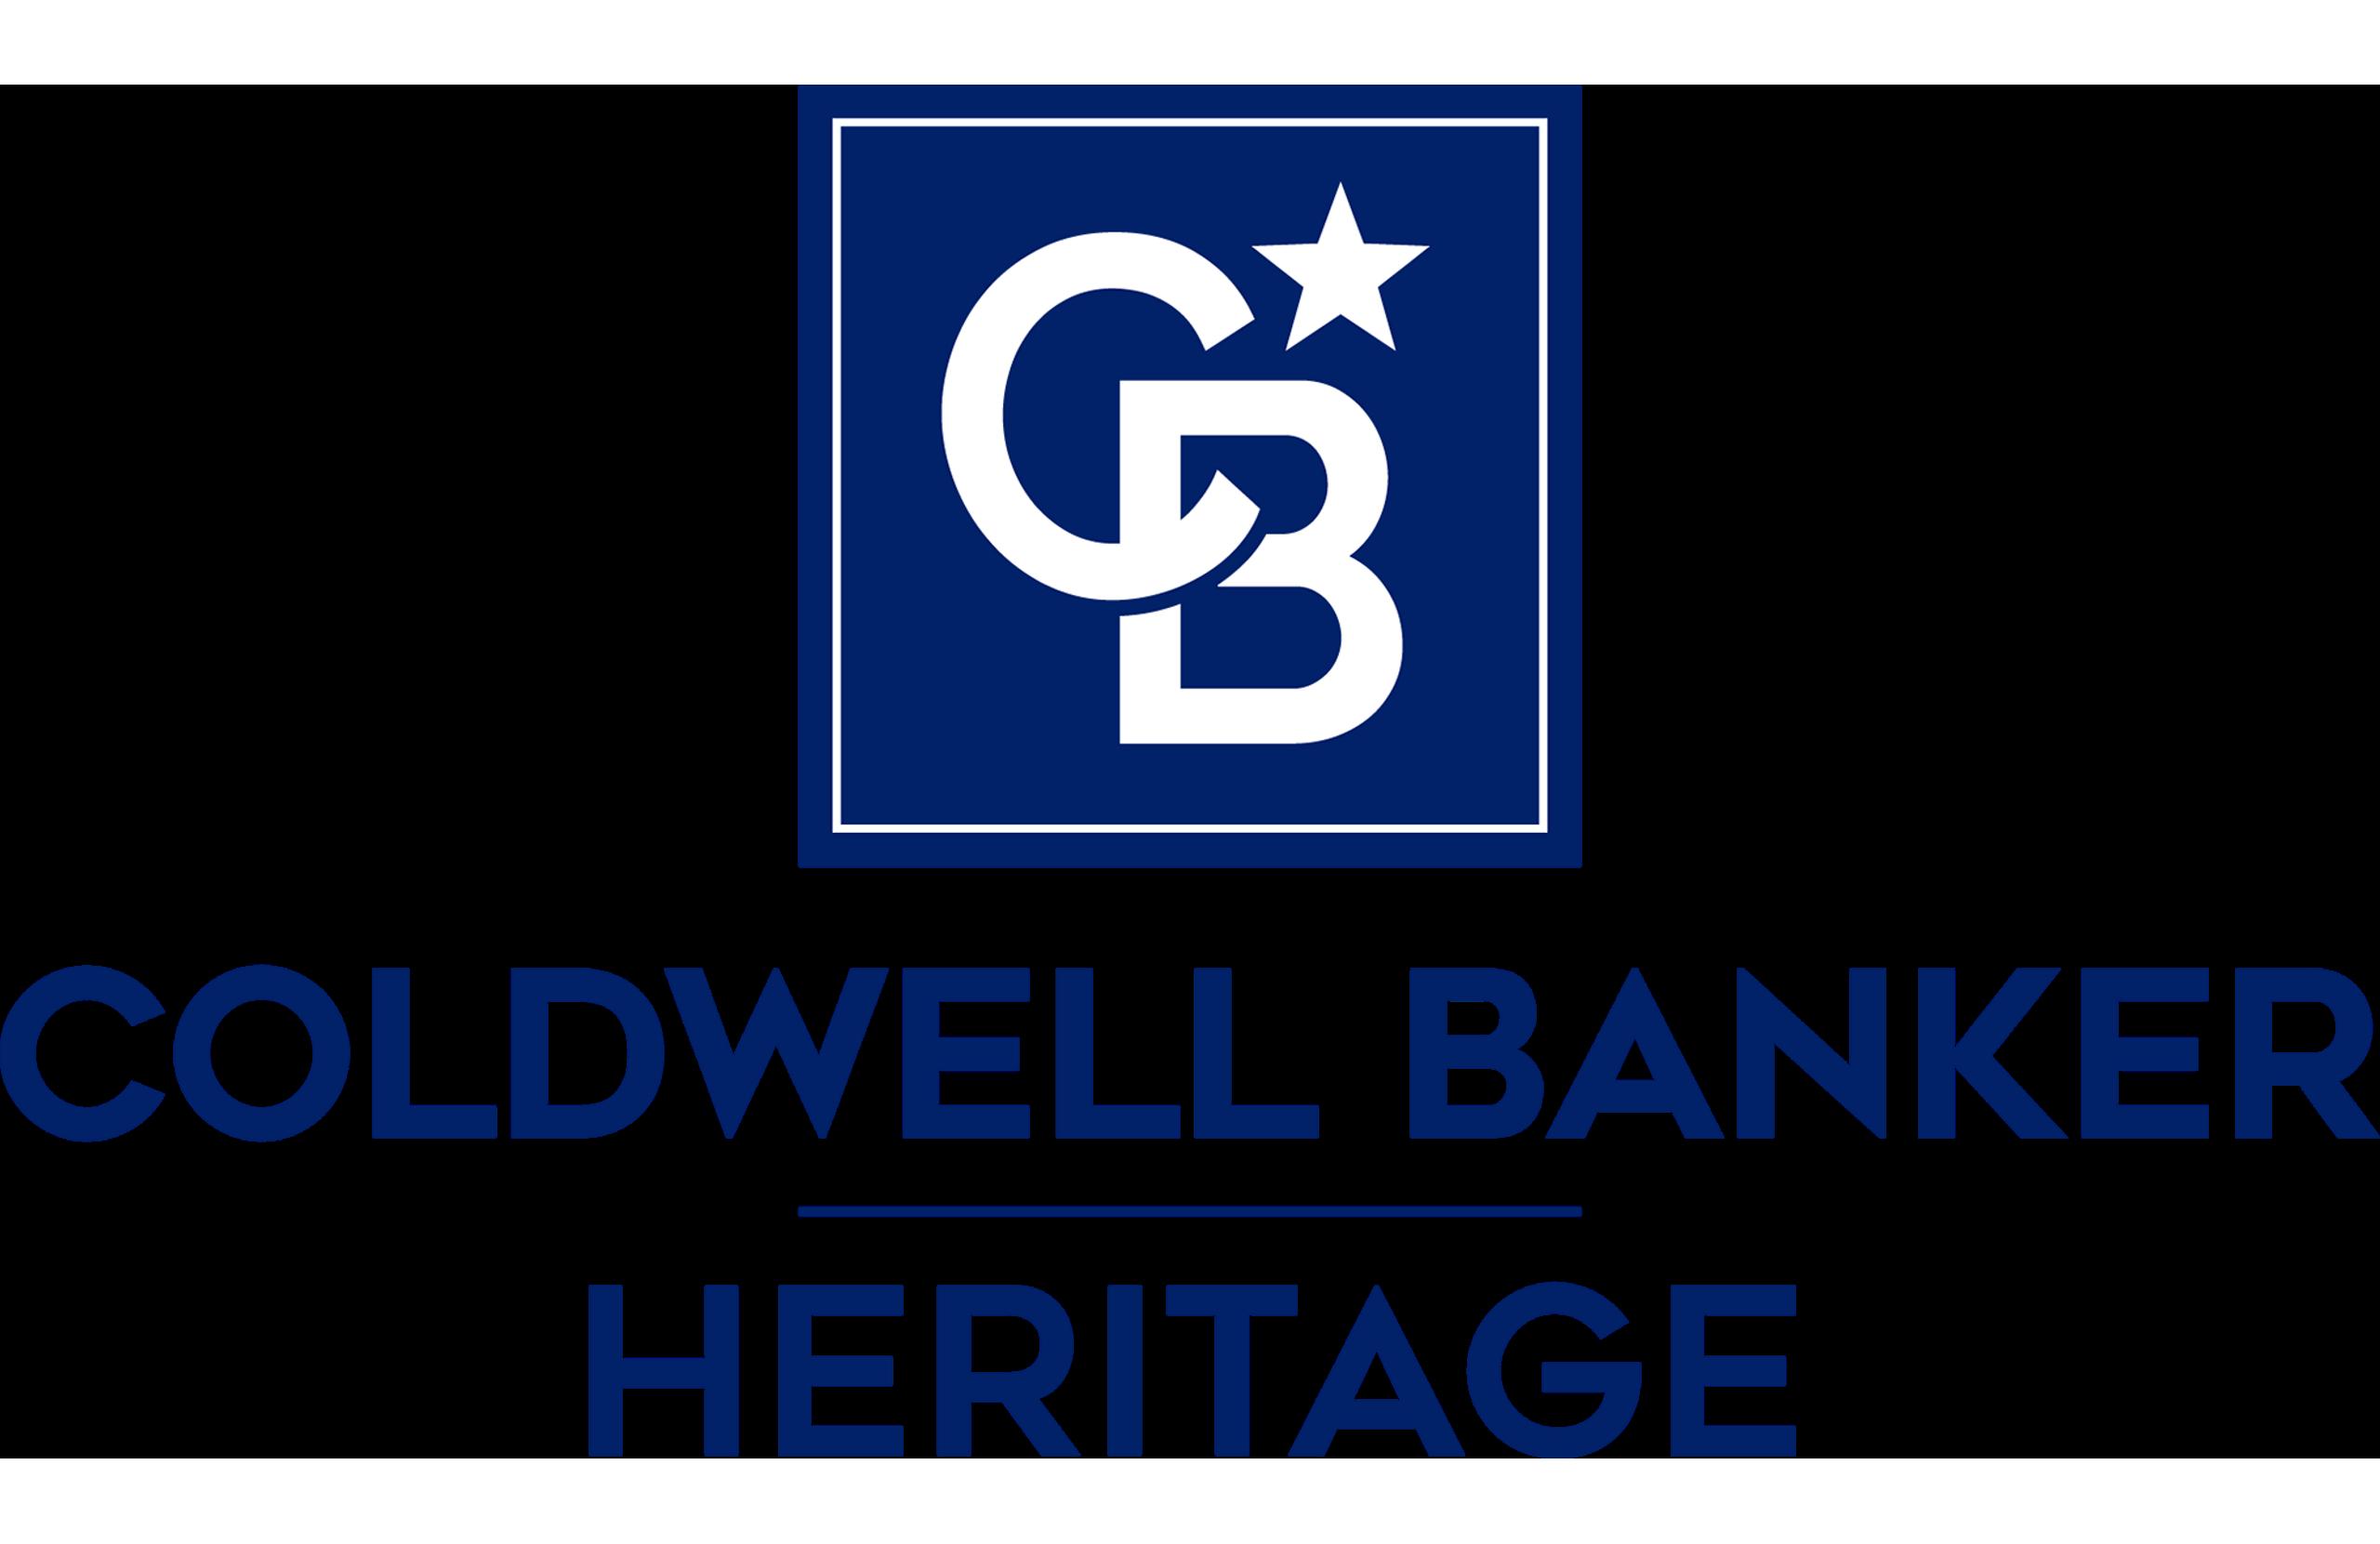 Morgan Walz - Coldwell Banker Heritage Logo